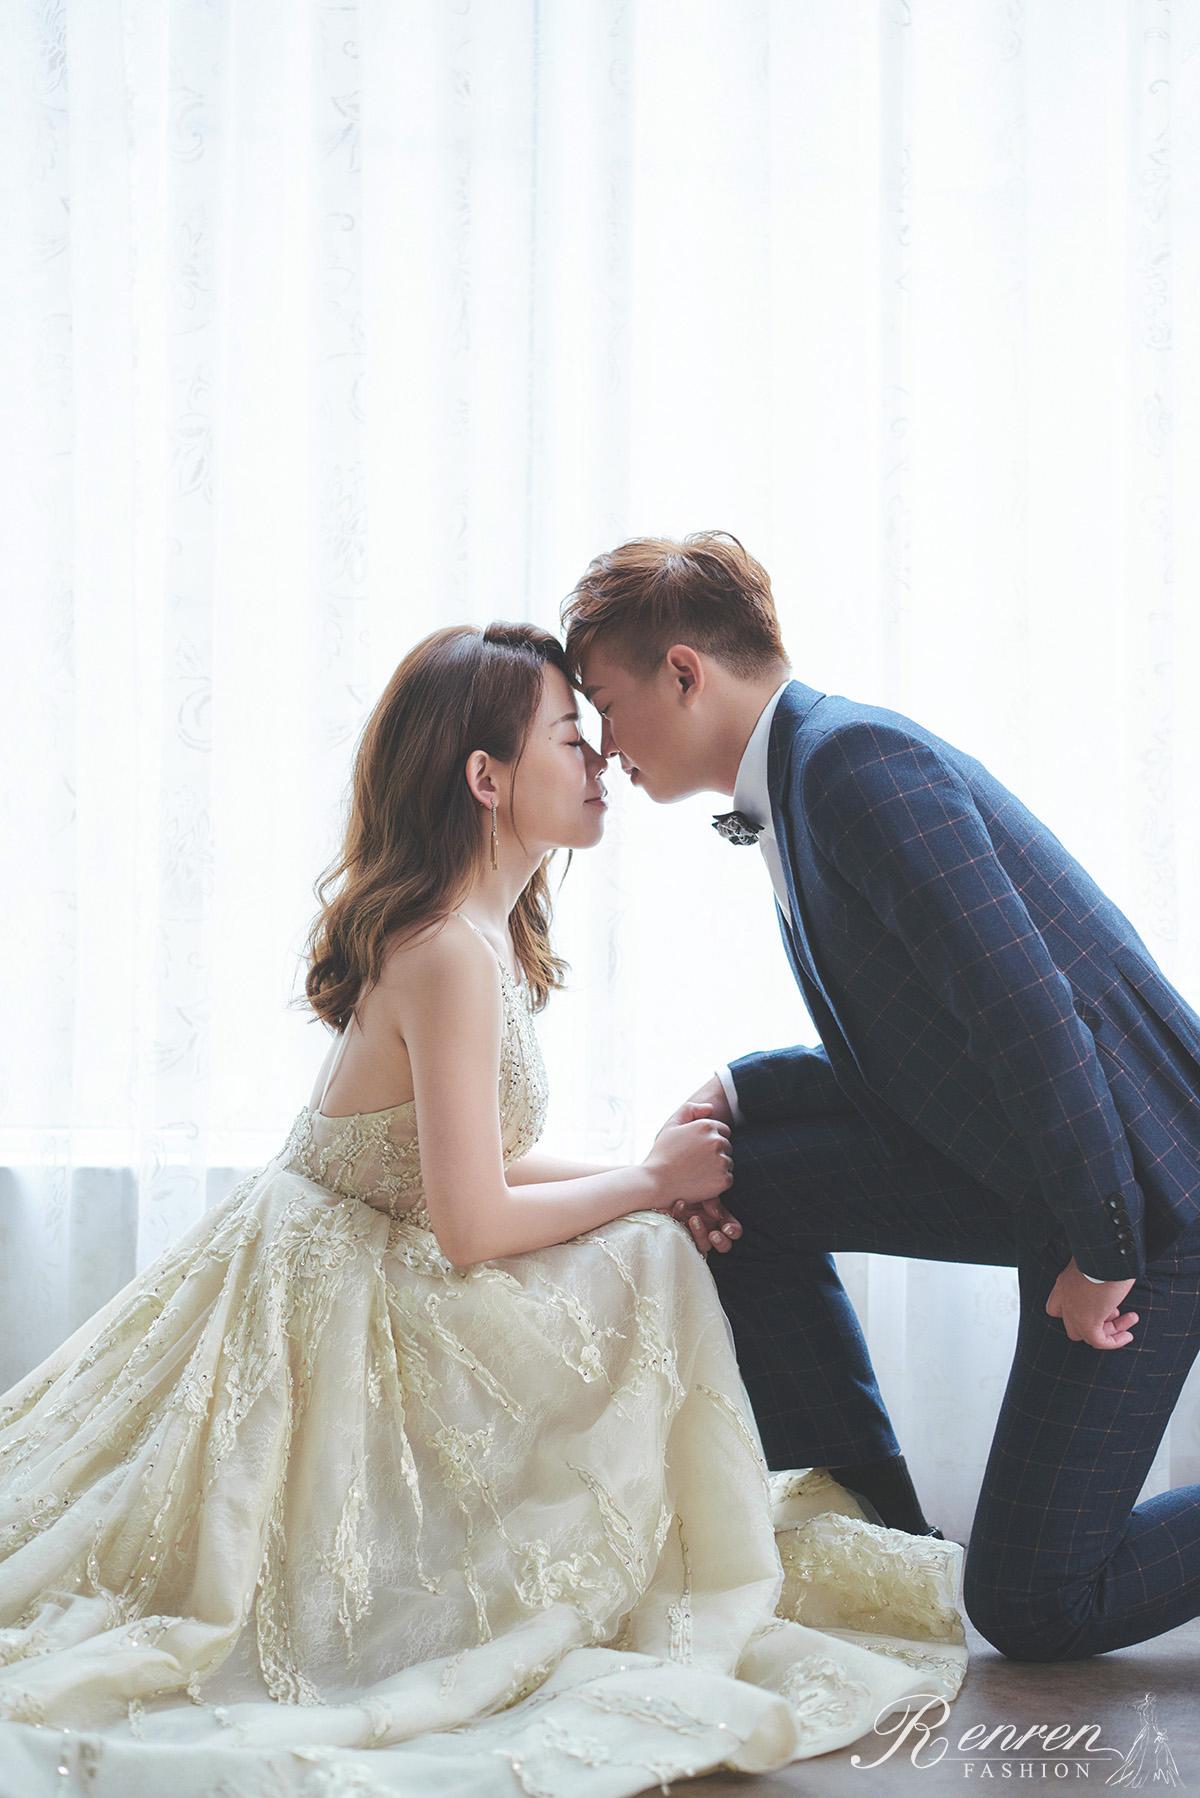 RenRen-MUNDO-StylistMei-台中-冉冉婚紗-02